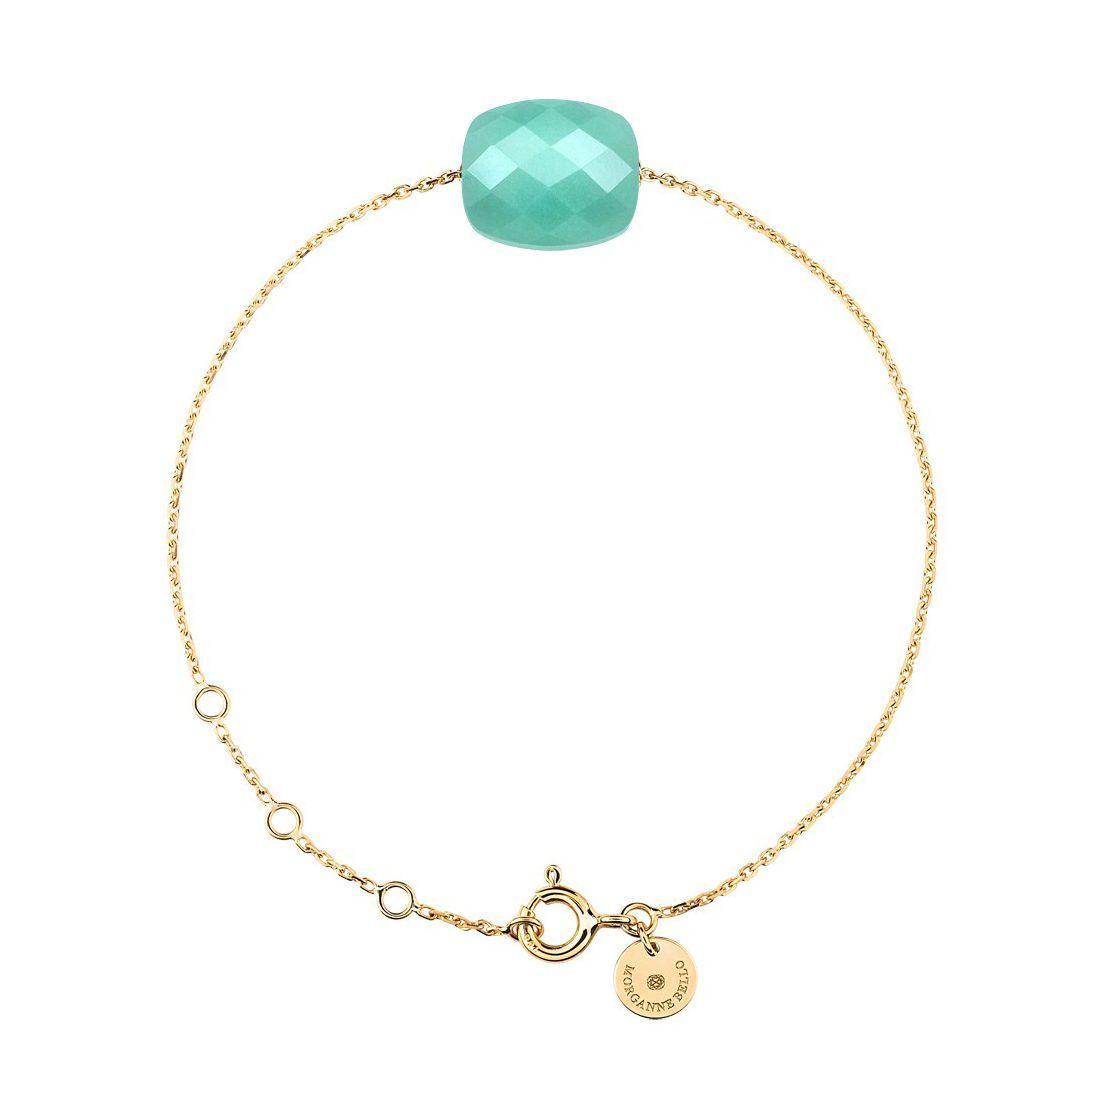 Bracelet Morganne Bello Friandise en or jaune et amazonite